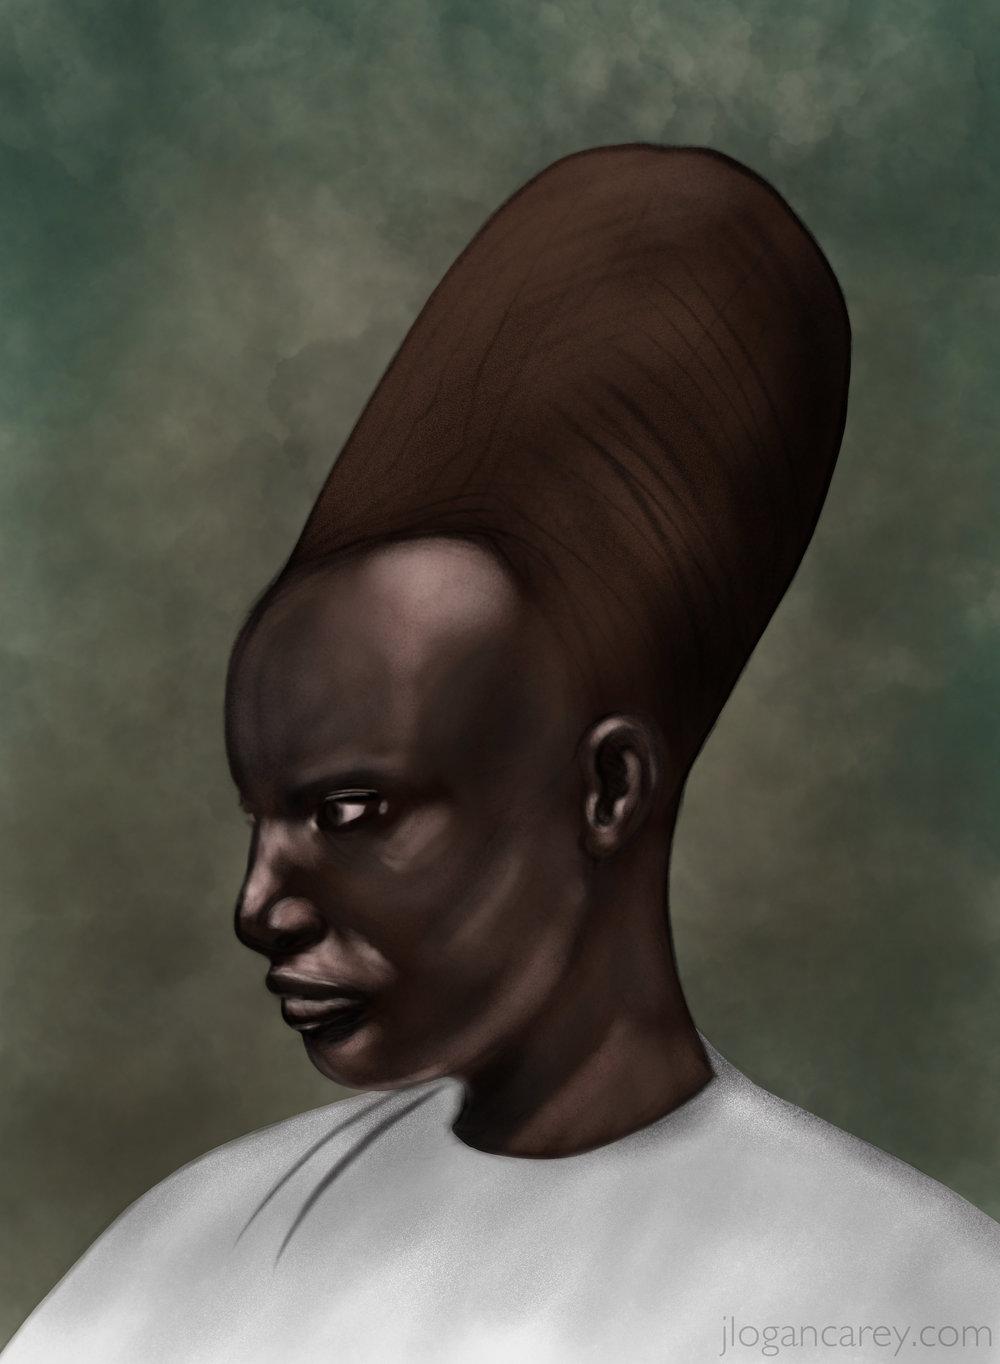 Another Rwandan portrait